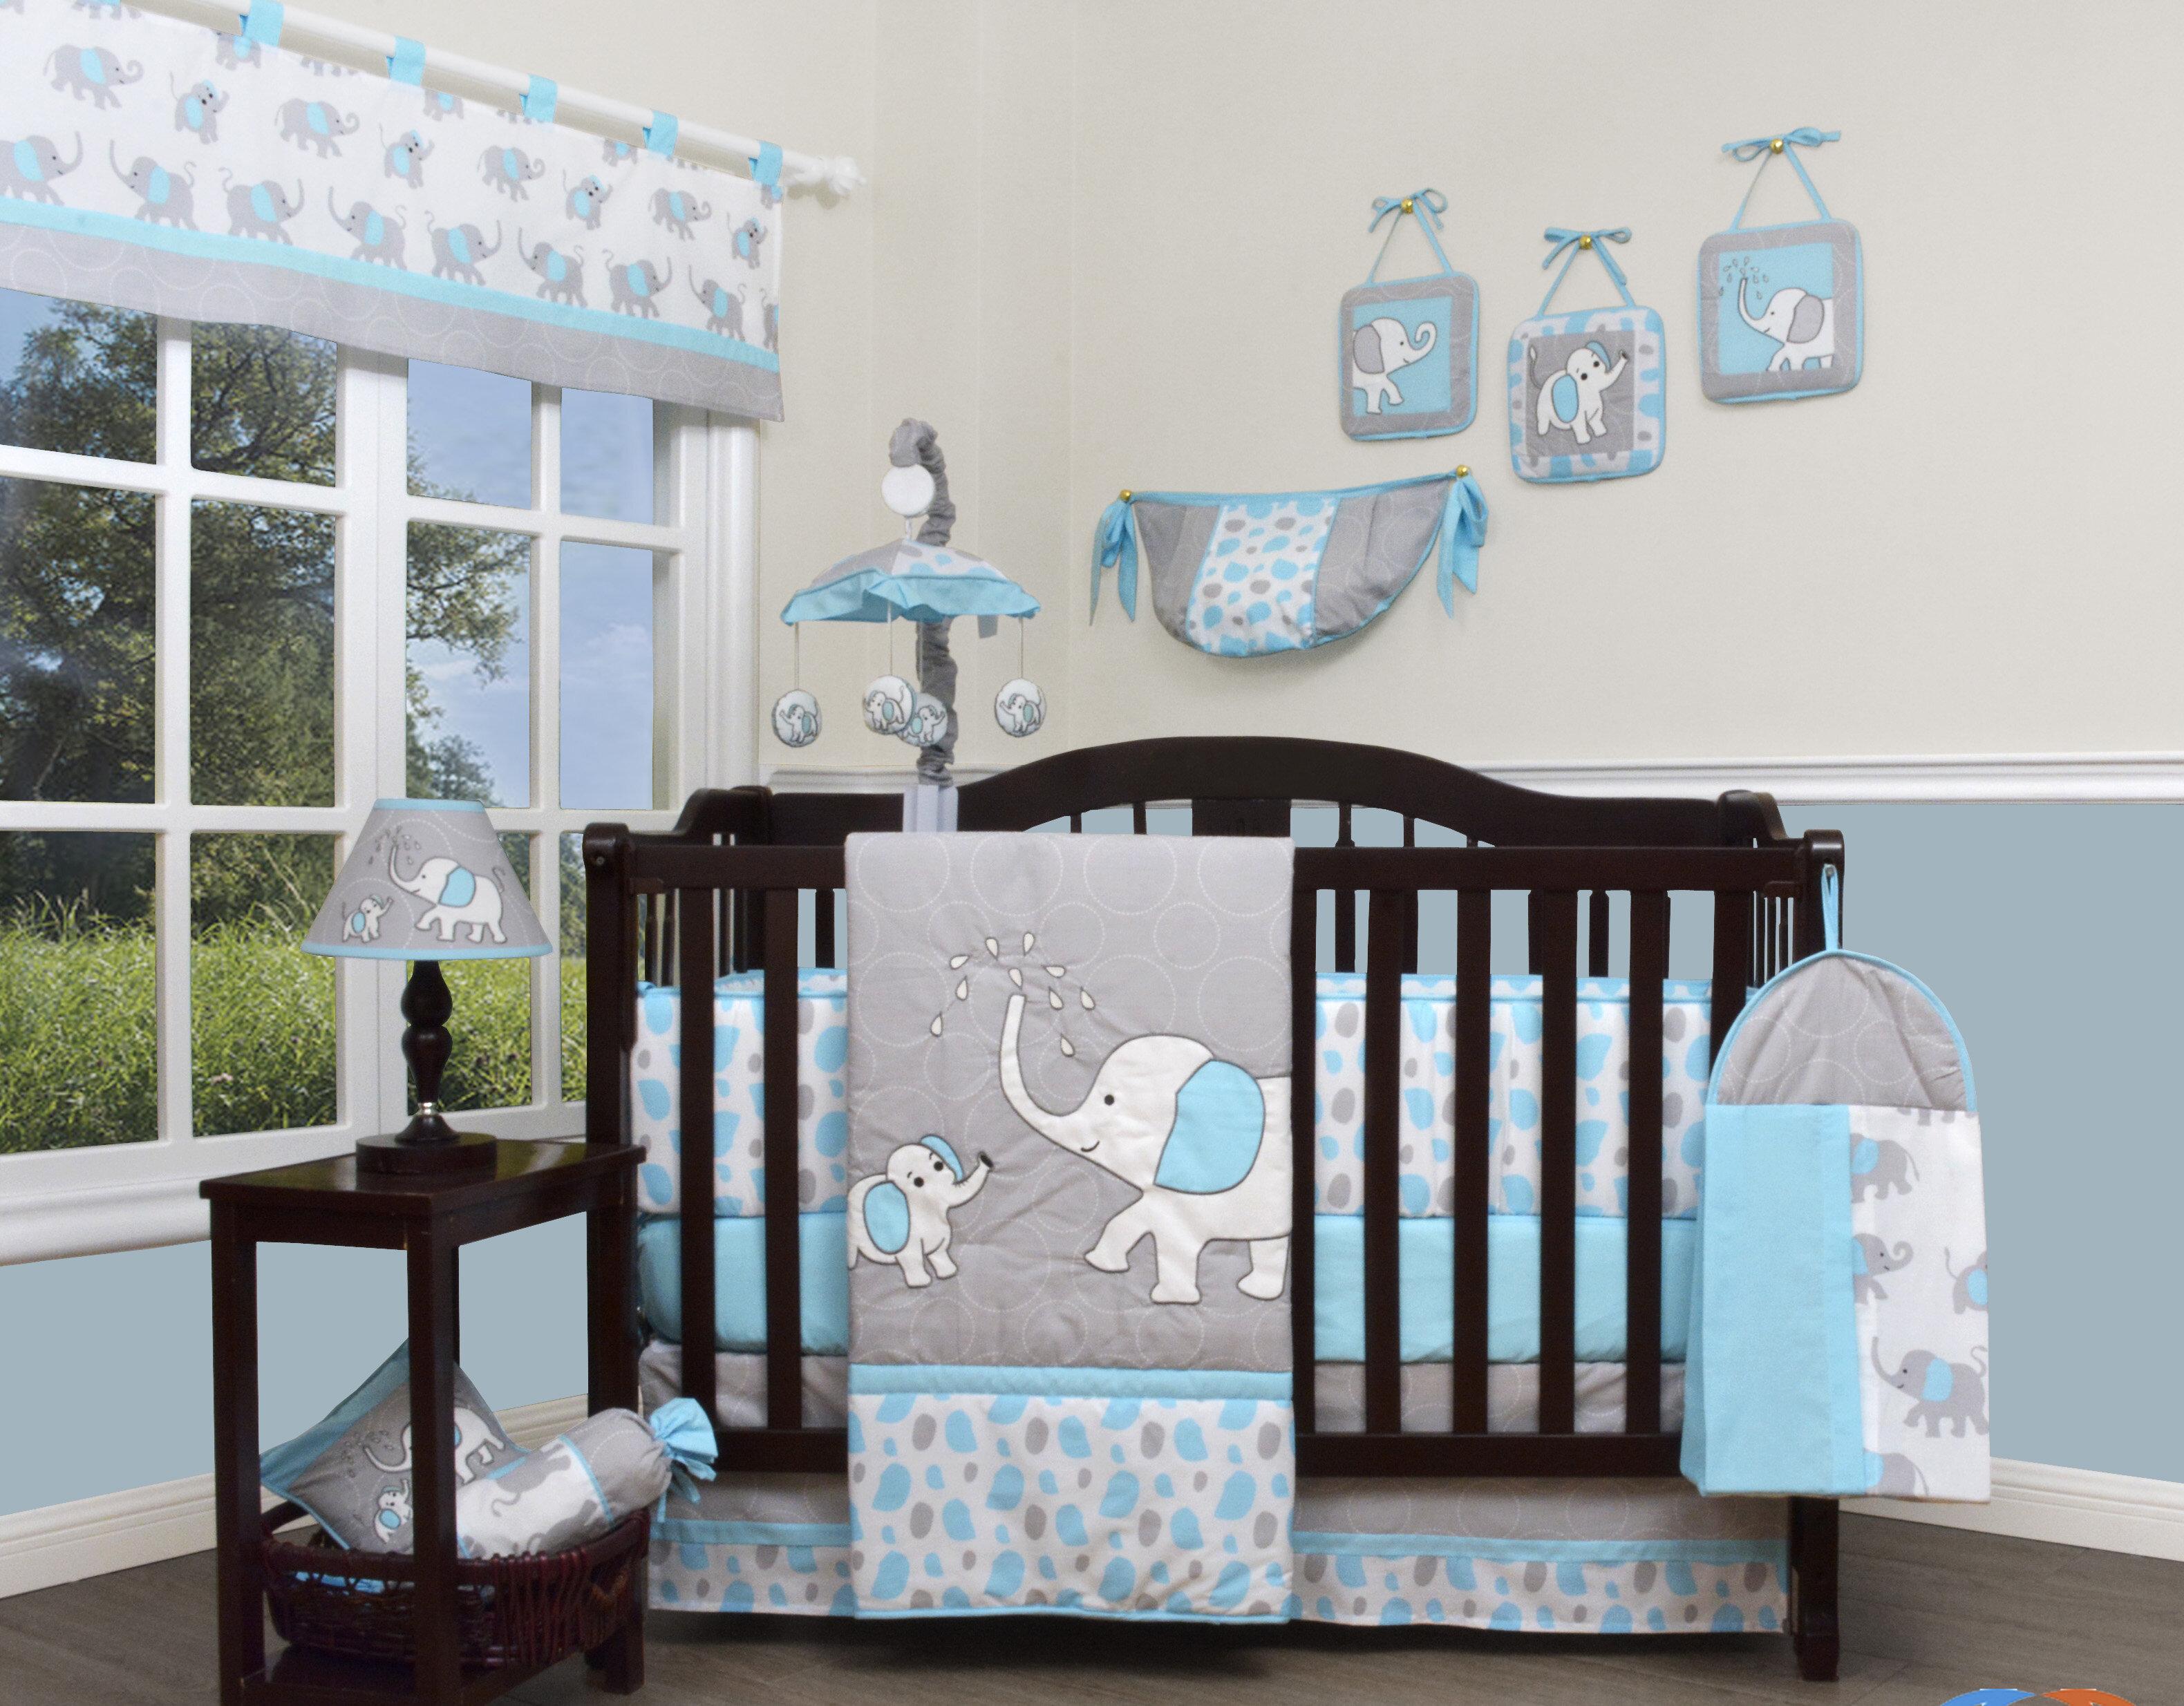 Geenny Blizzard Elephant 13 Piece Crib Bedding Set & Reviews | Wayfair